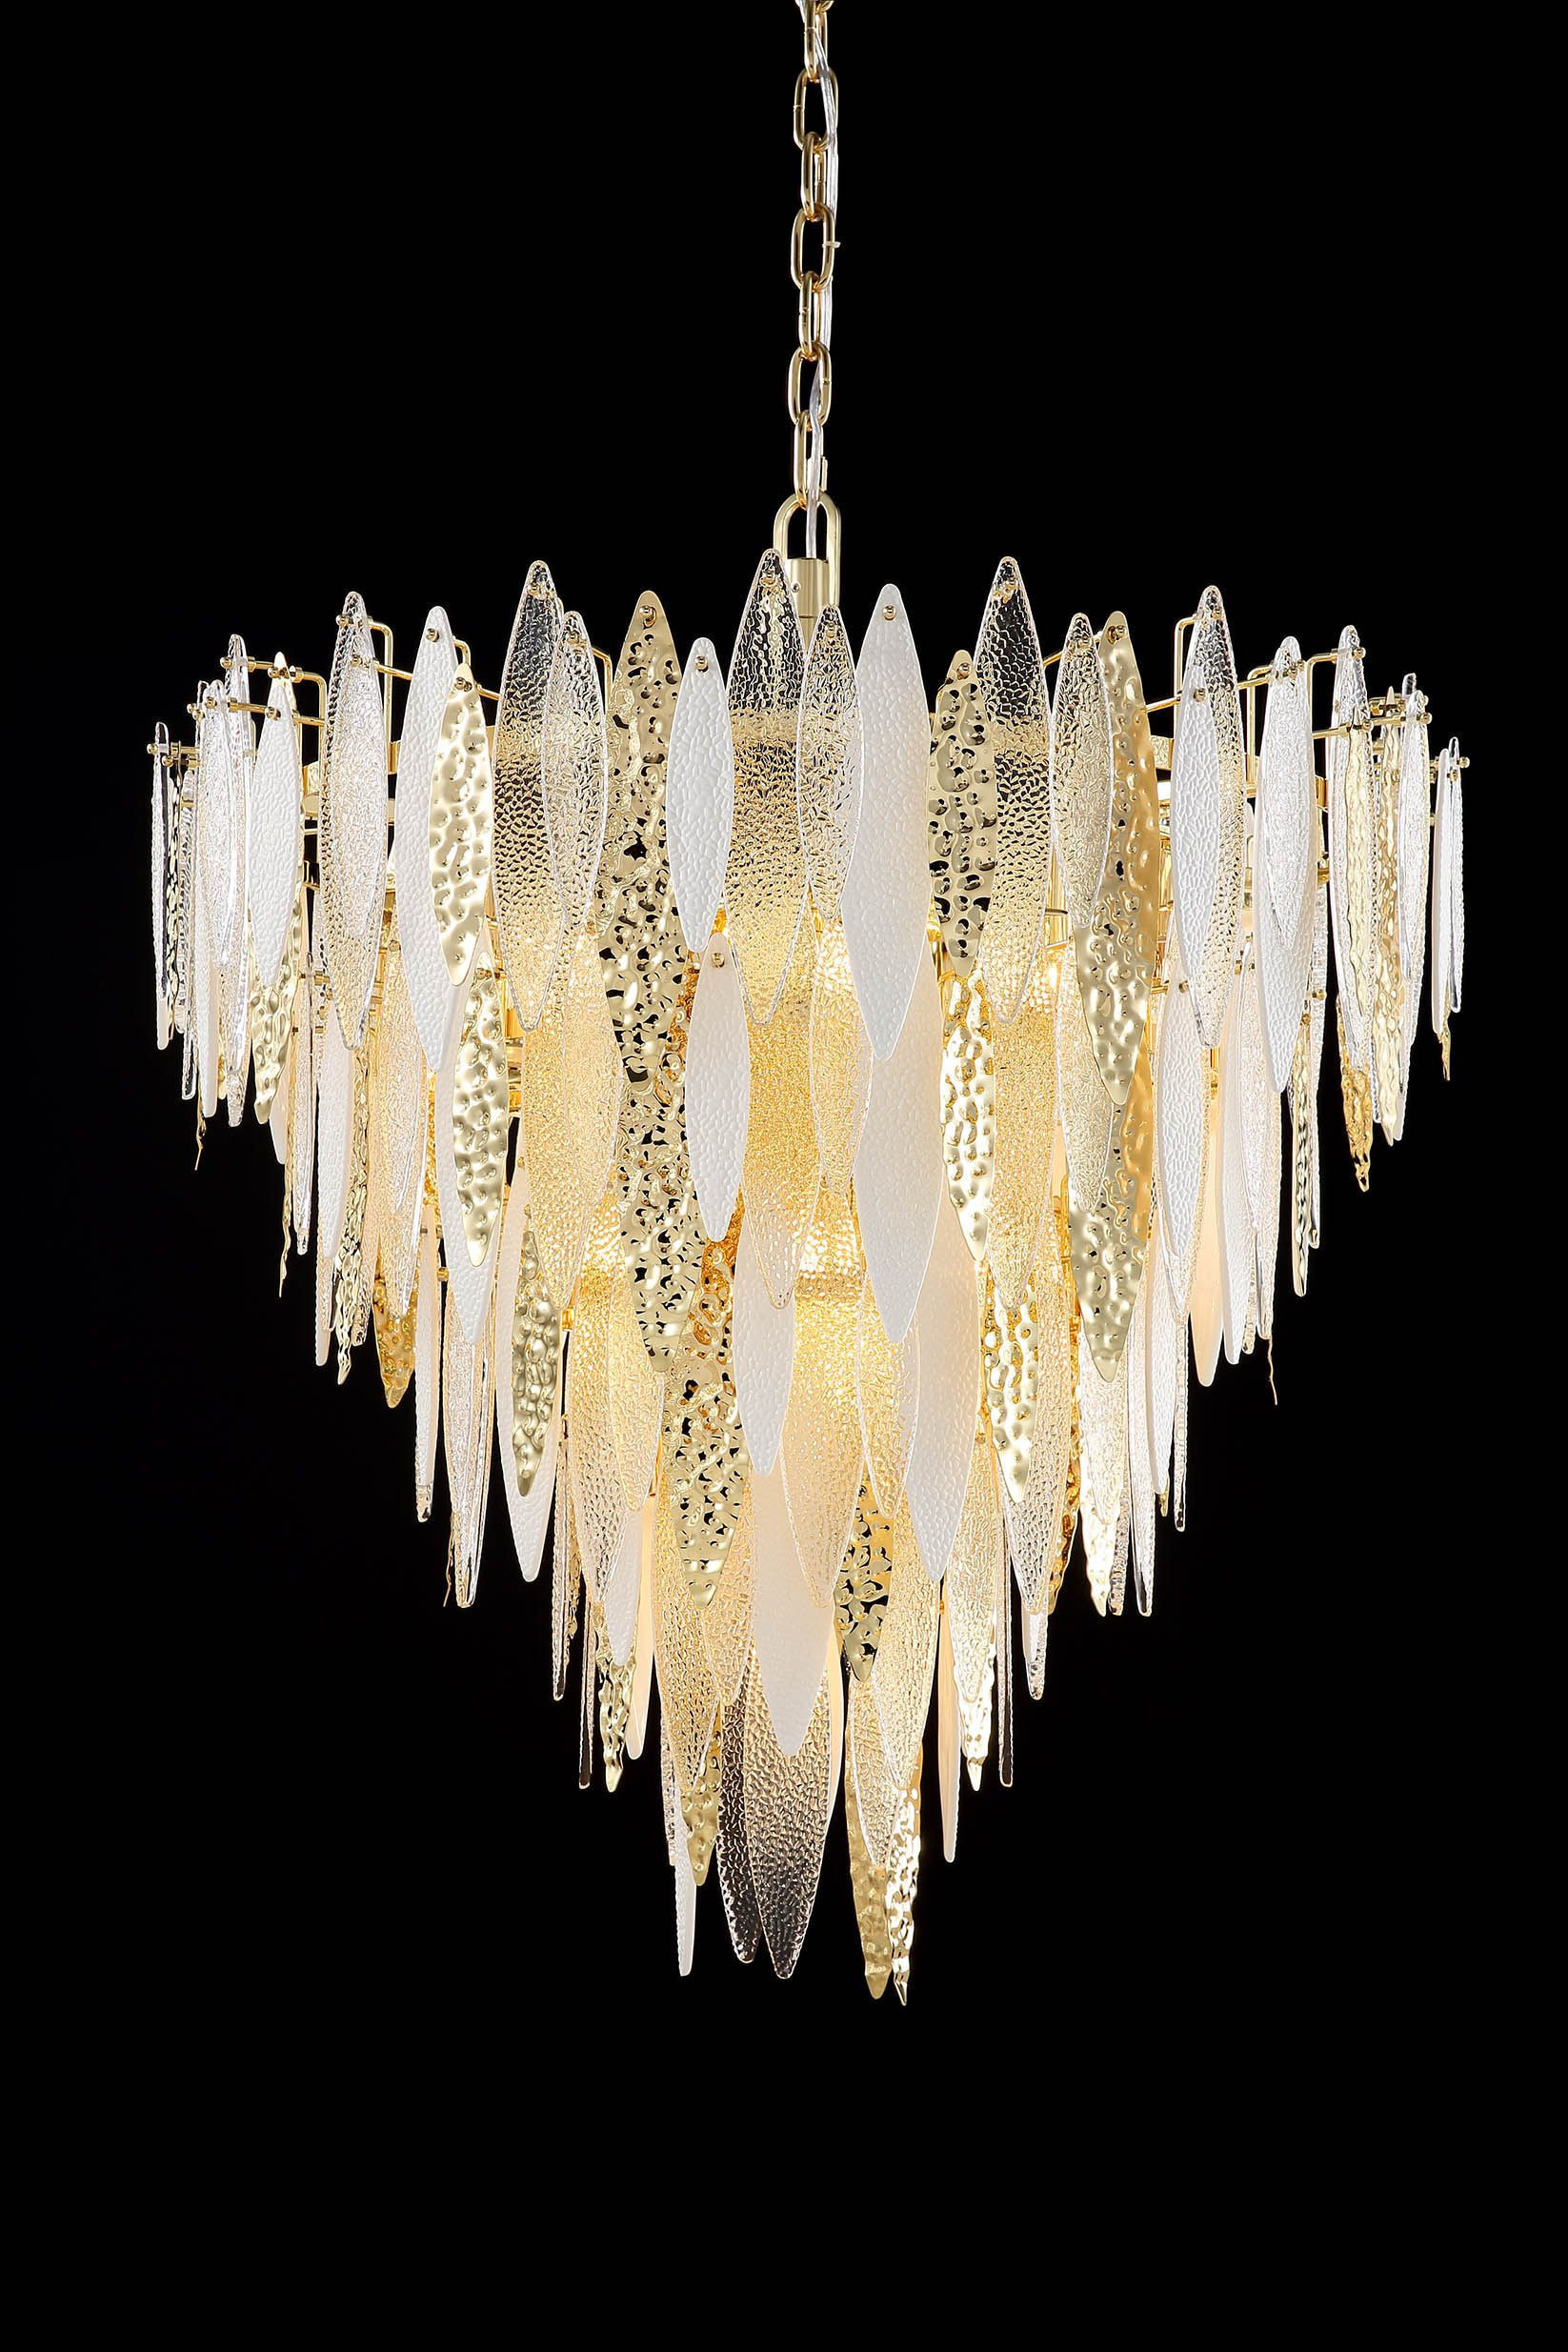 Latest Chandeliers Pendant Lights Manufacturers Suppliers Wholesalers Exporters Tradewheel